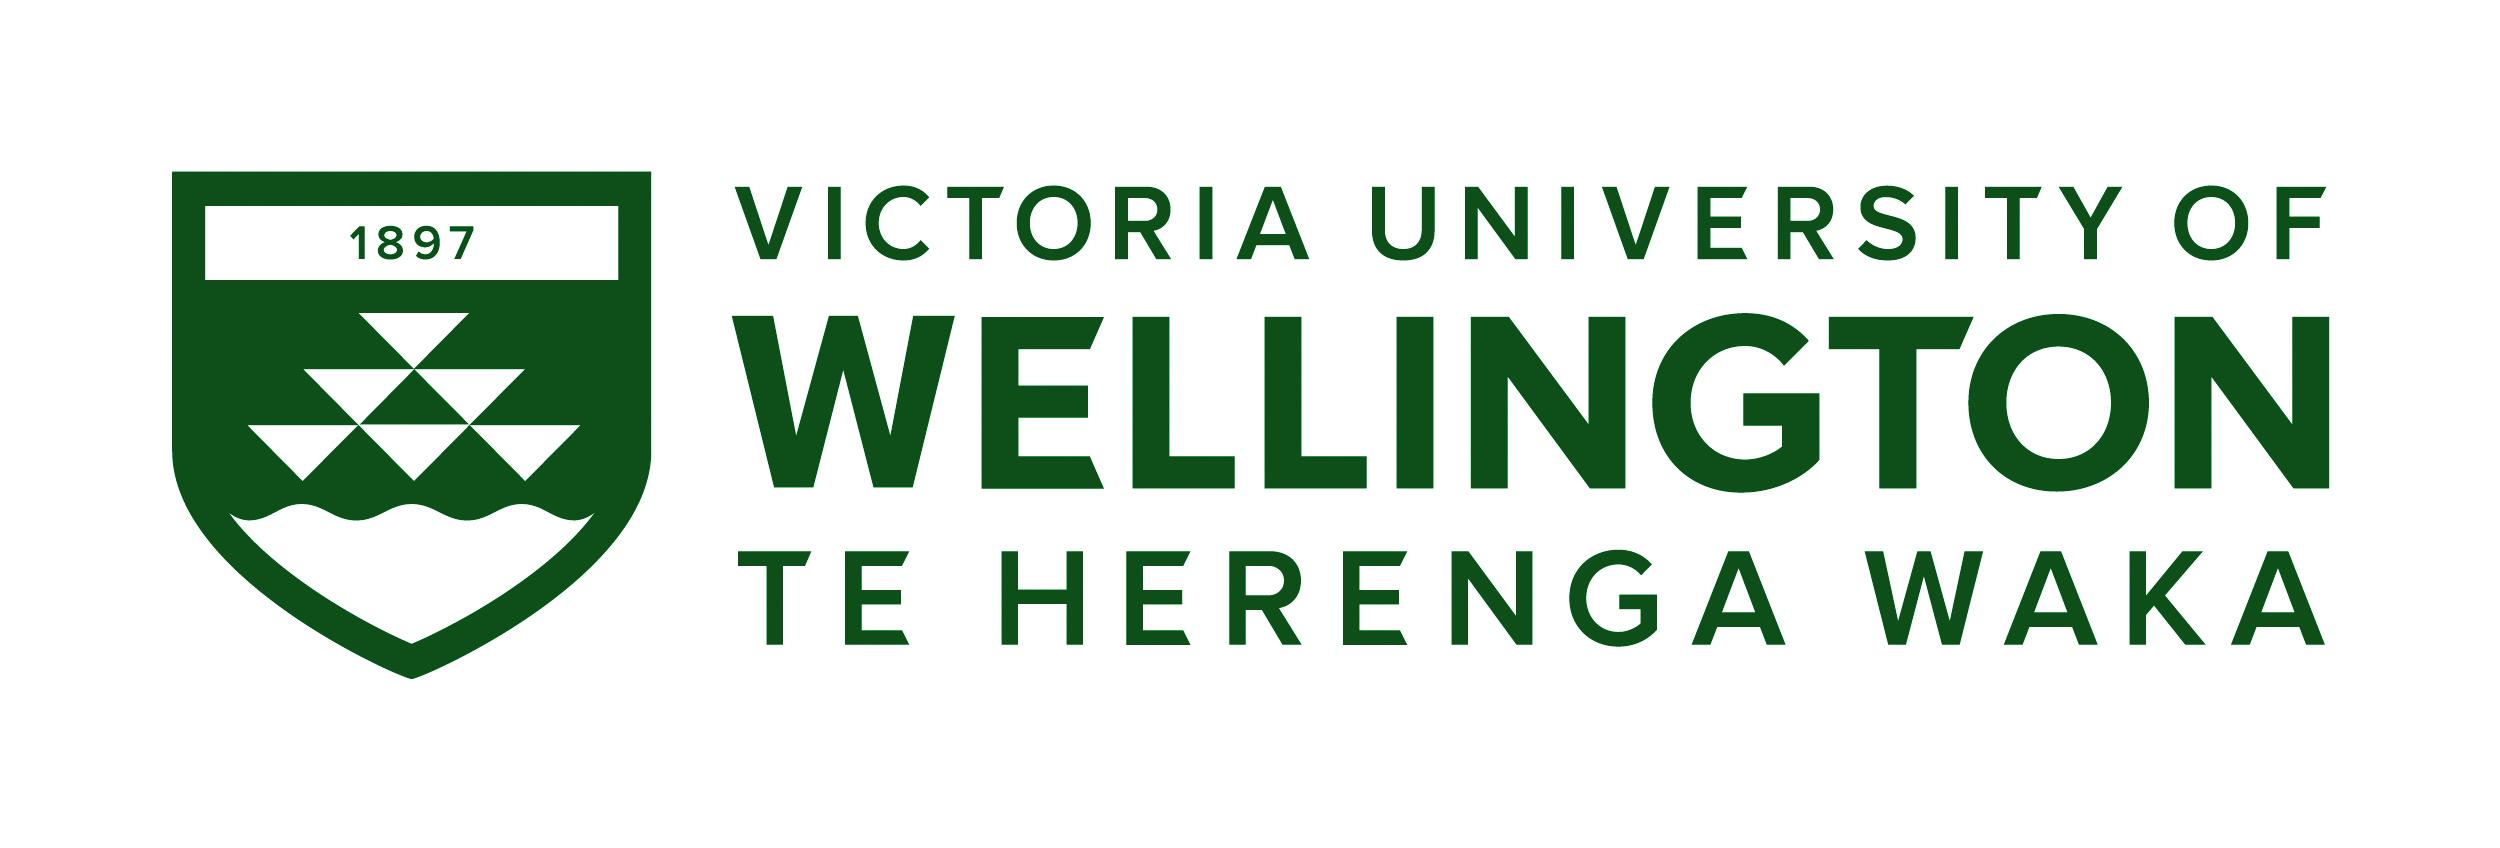 Victoria University of Wellington - Te Herenga Waka